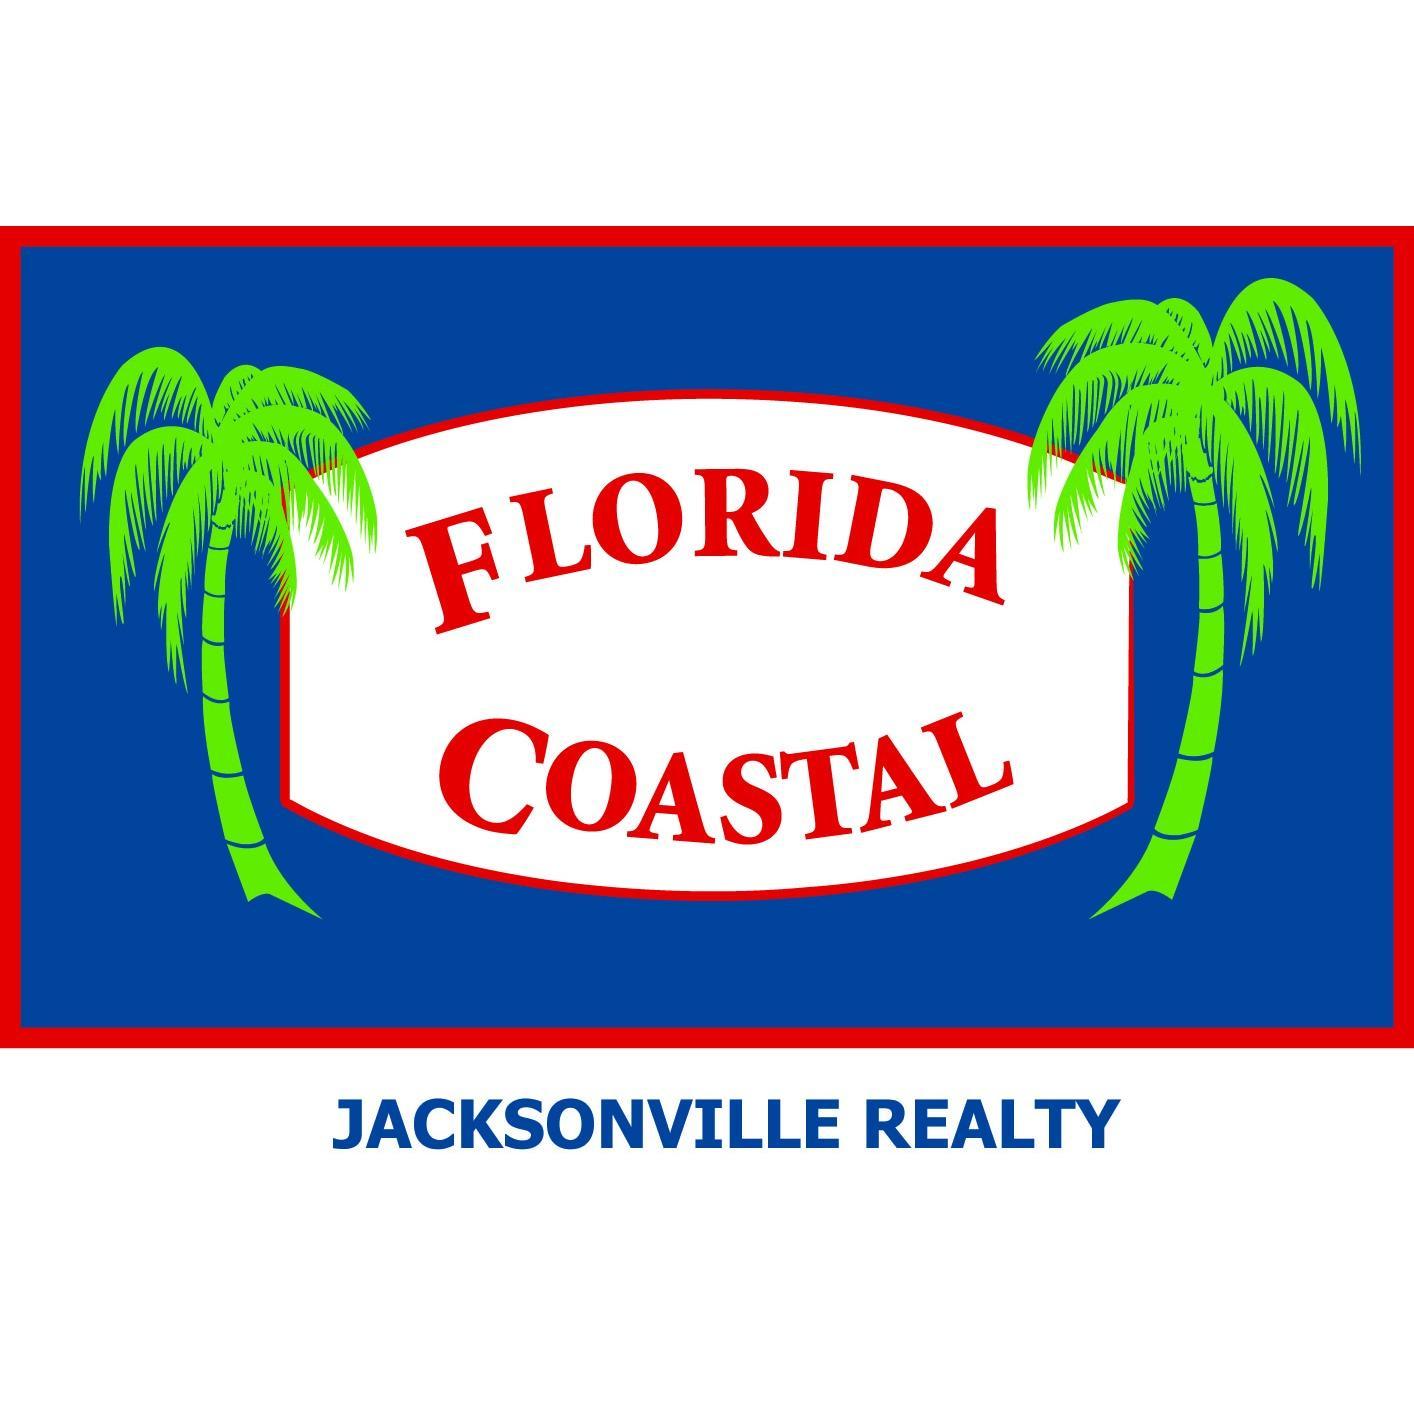 Florida Coastal Jacksonville Realty Inc.